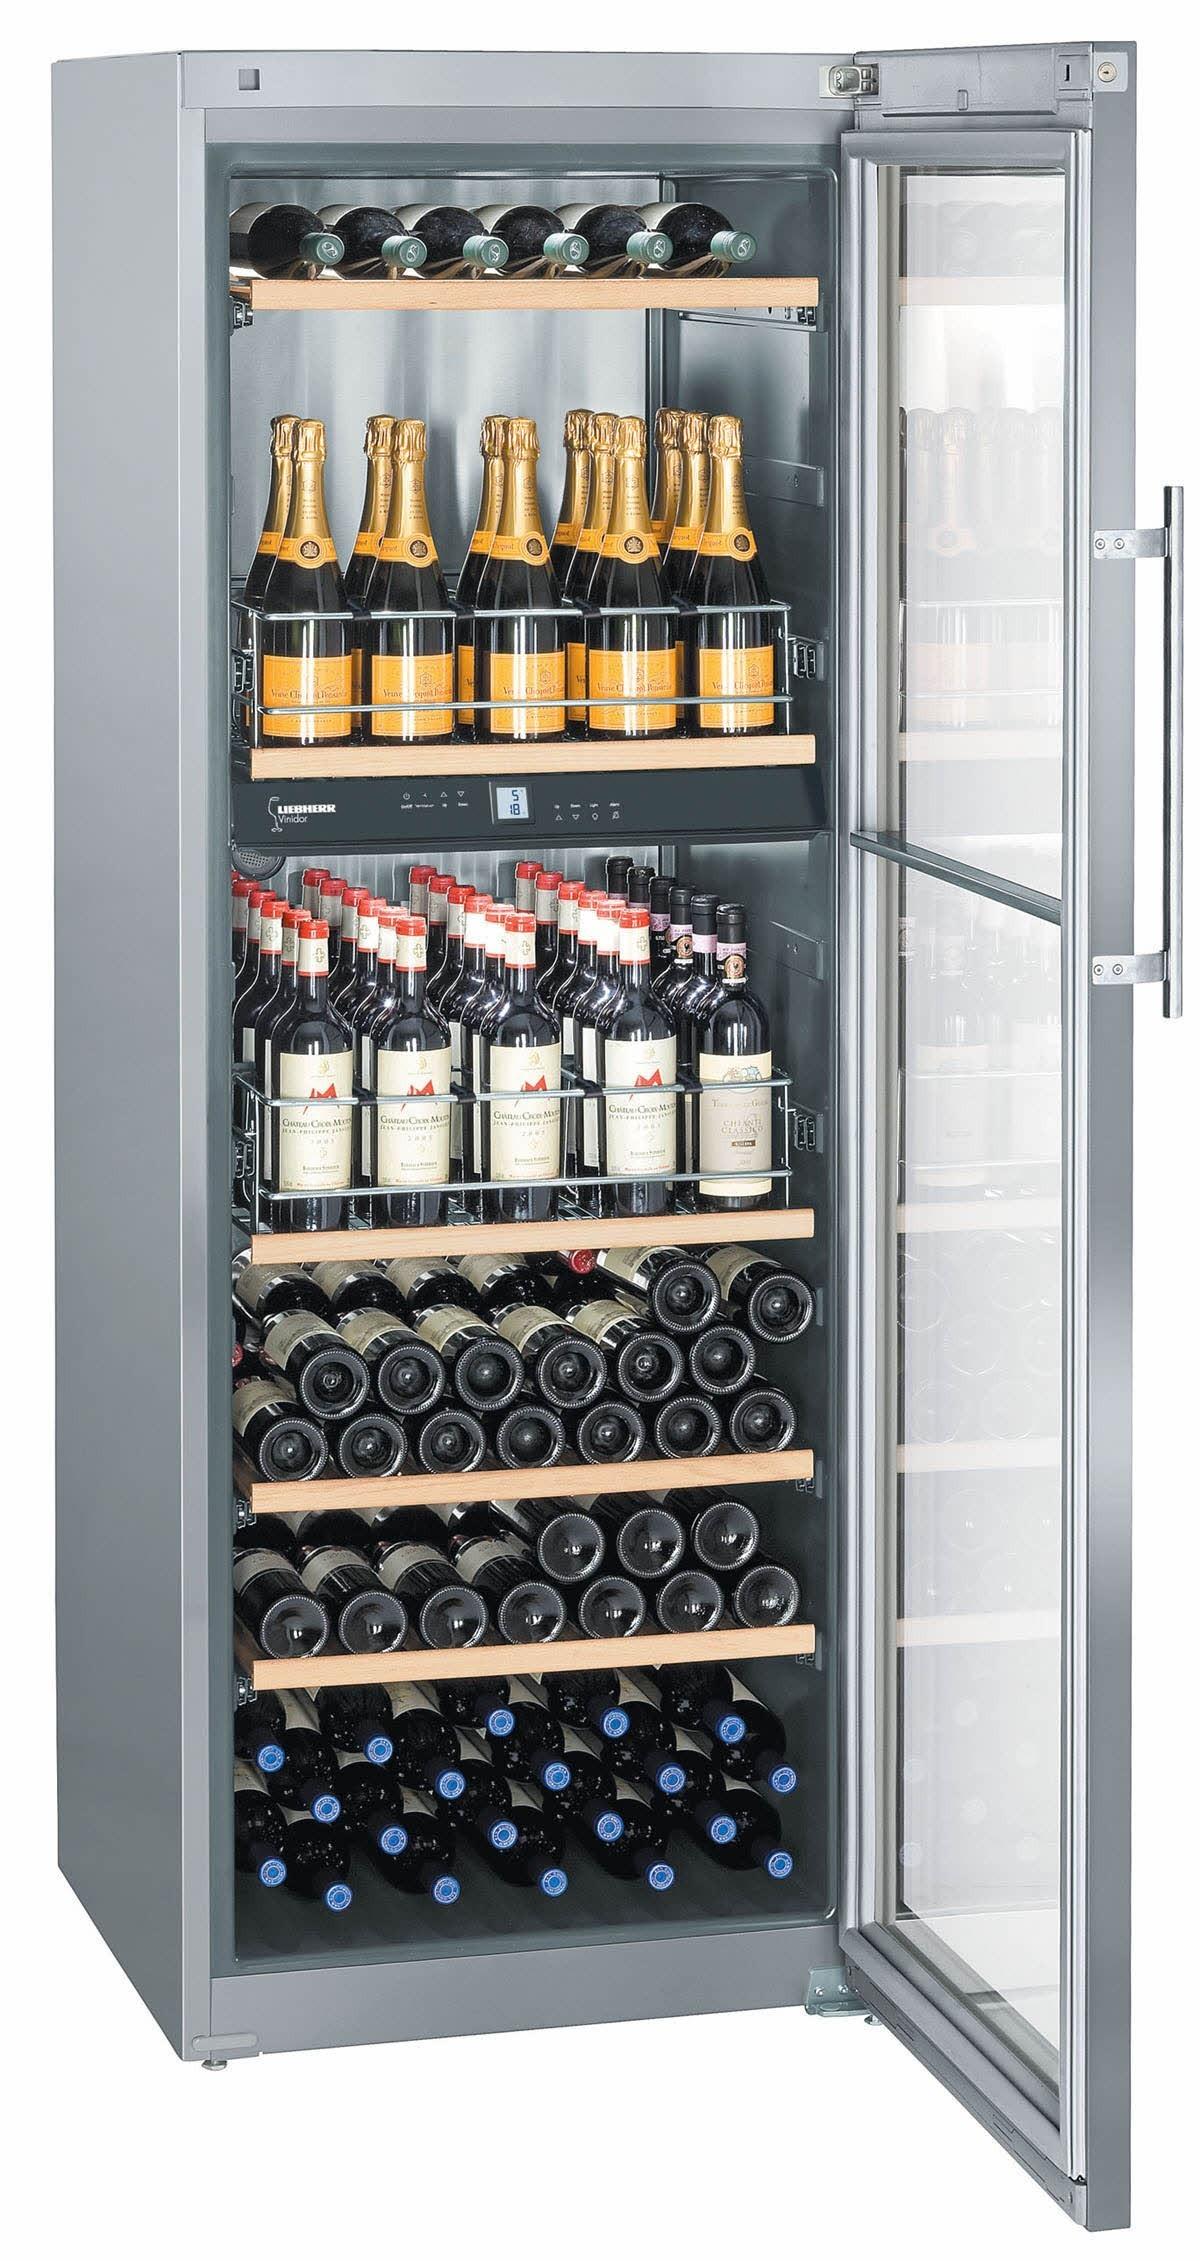 cave vin multizones liebherr wtpes 5972 livraison en suisse. Black Bedroom Furniture Sets. Home Design Ideas